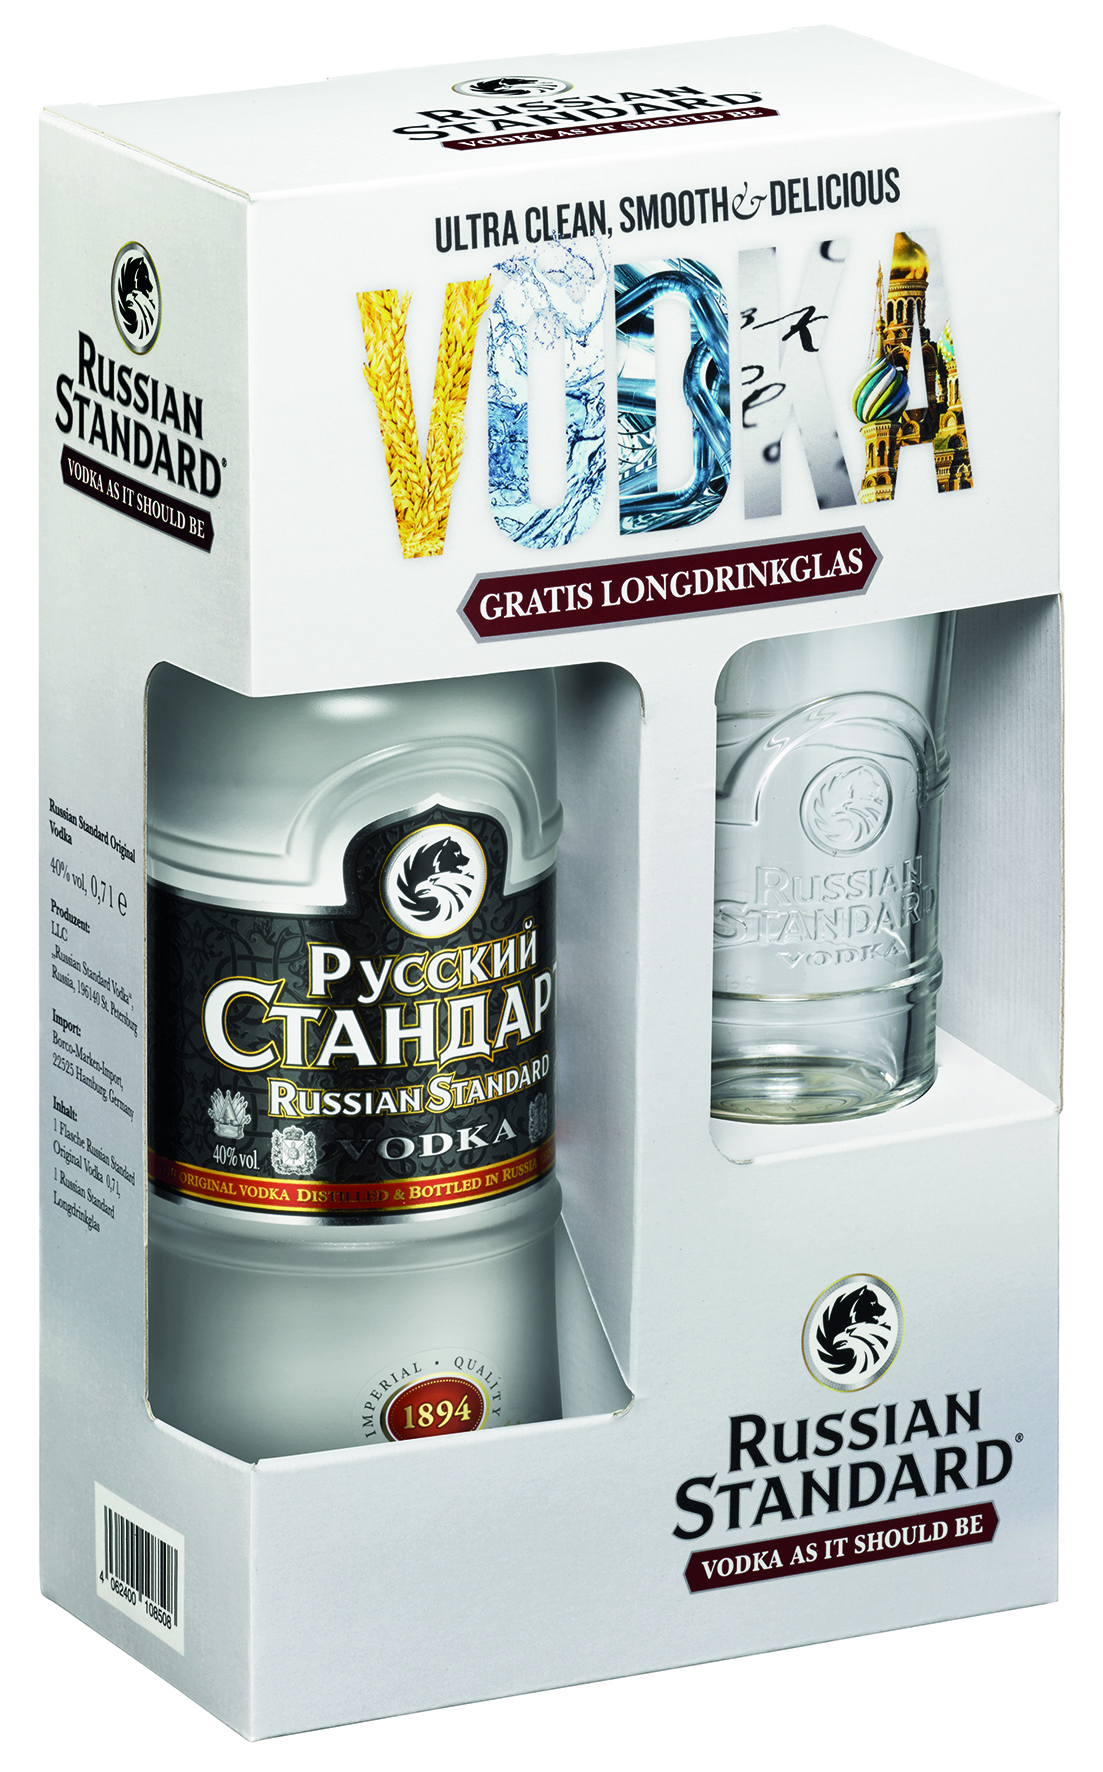 Russian Standard Vodka: Geschenkverpackung mit Longdrinkglas